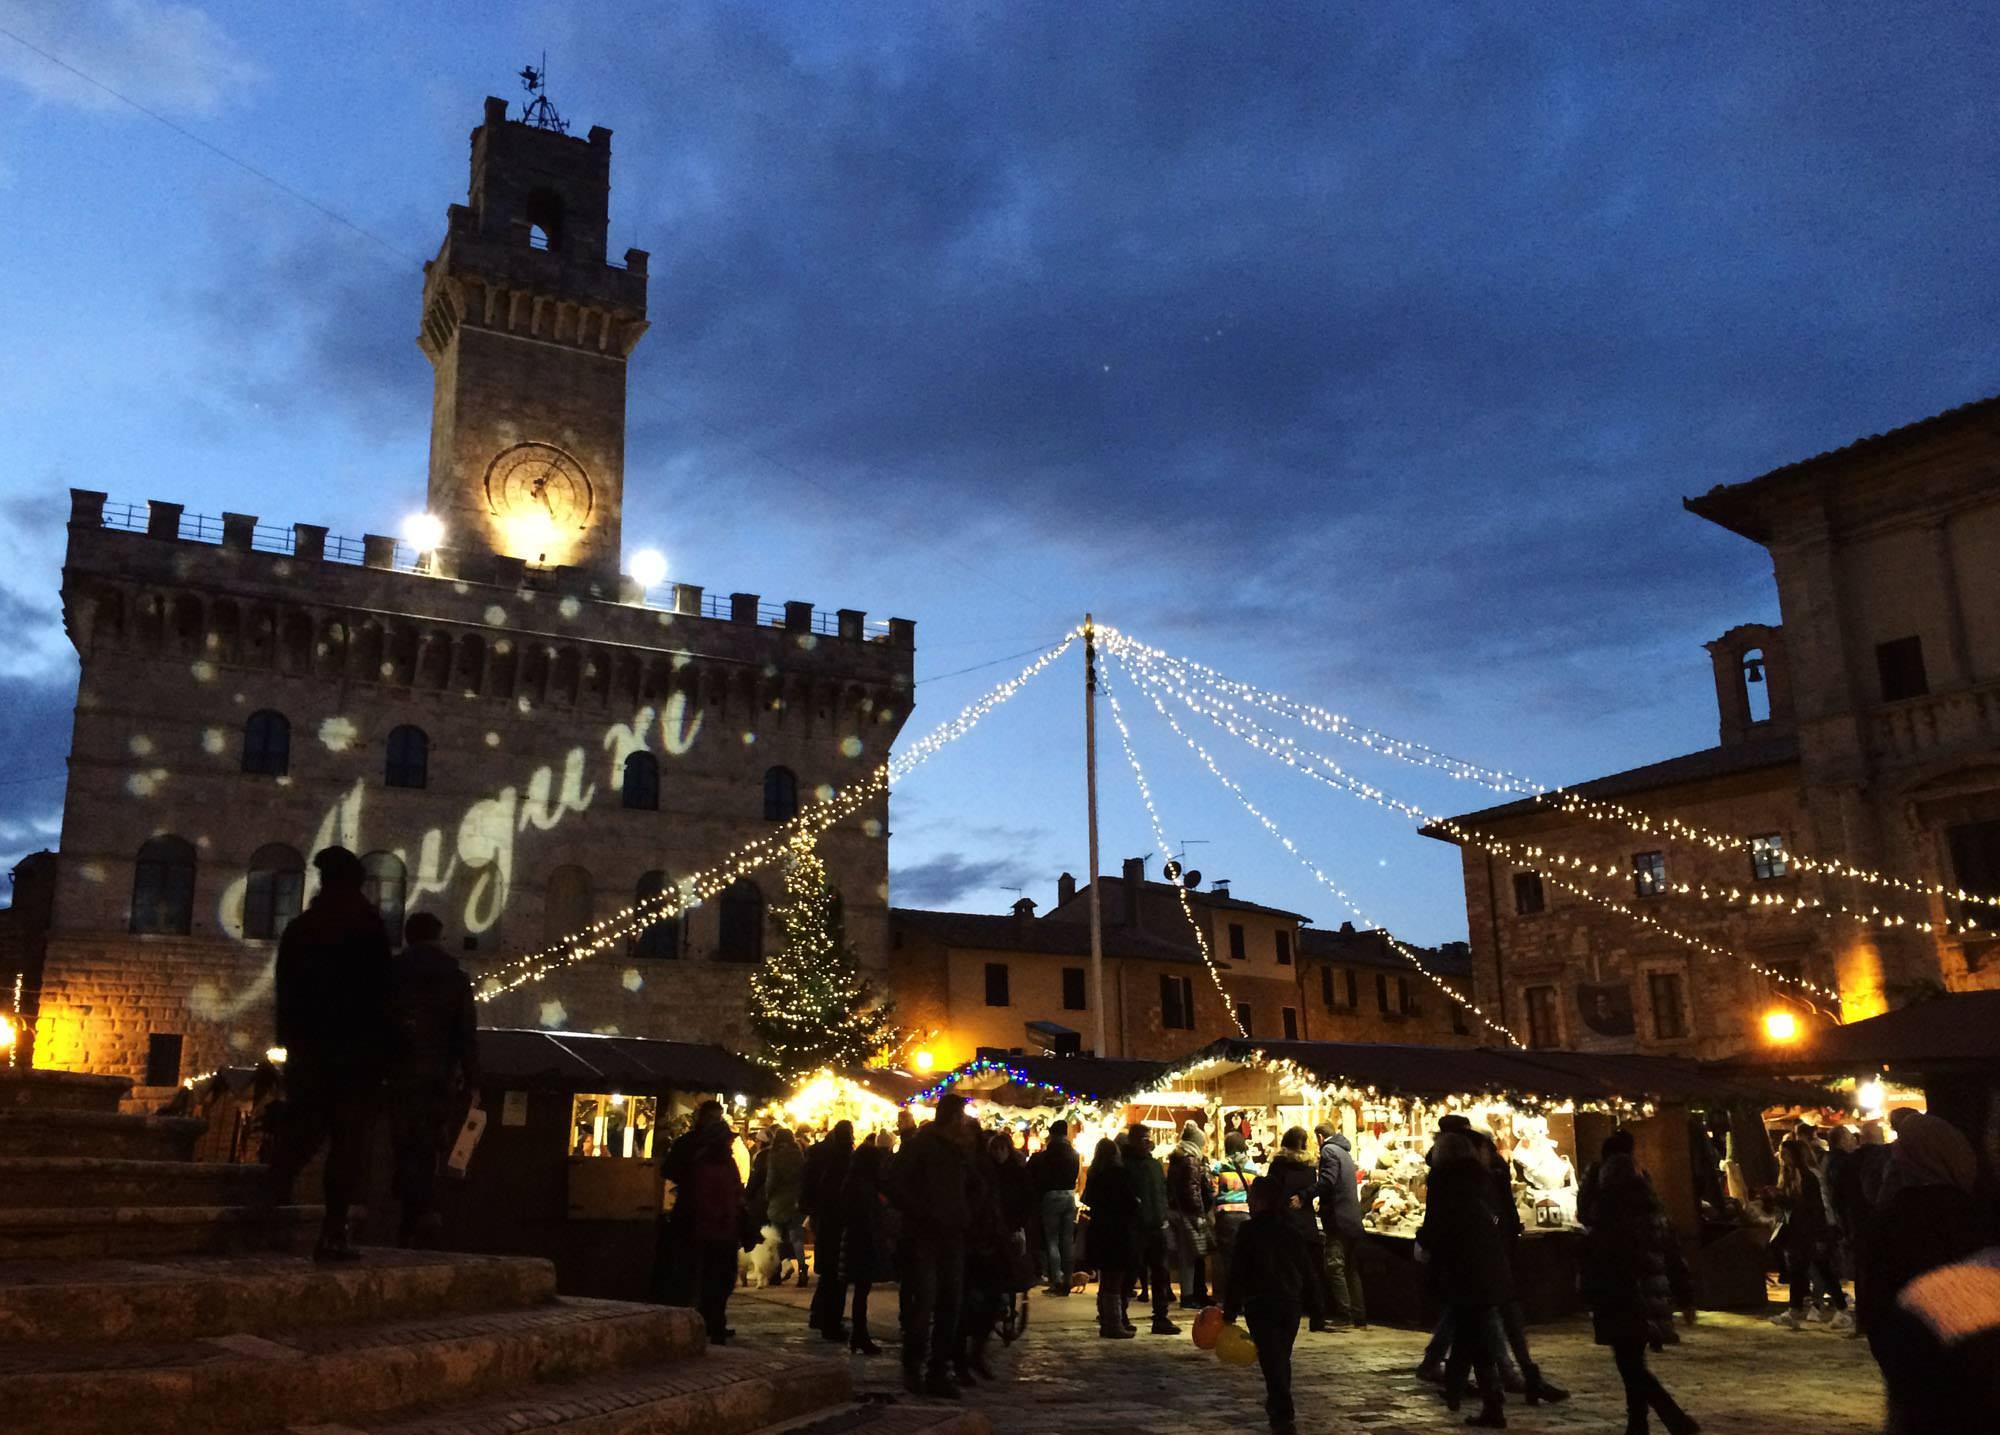 Christmas Market in Montepulciano